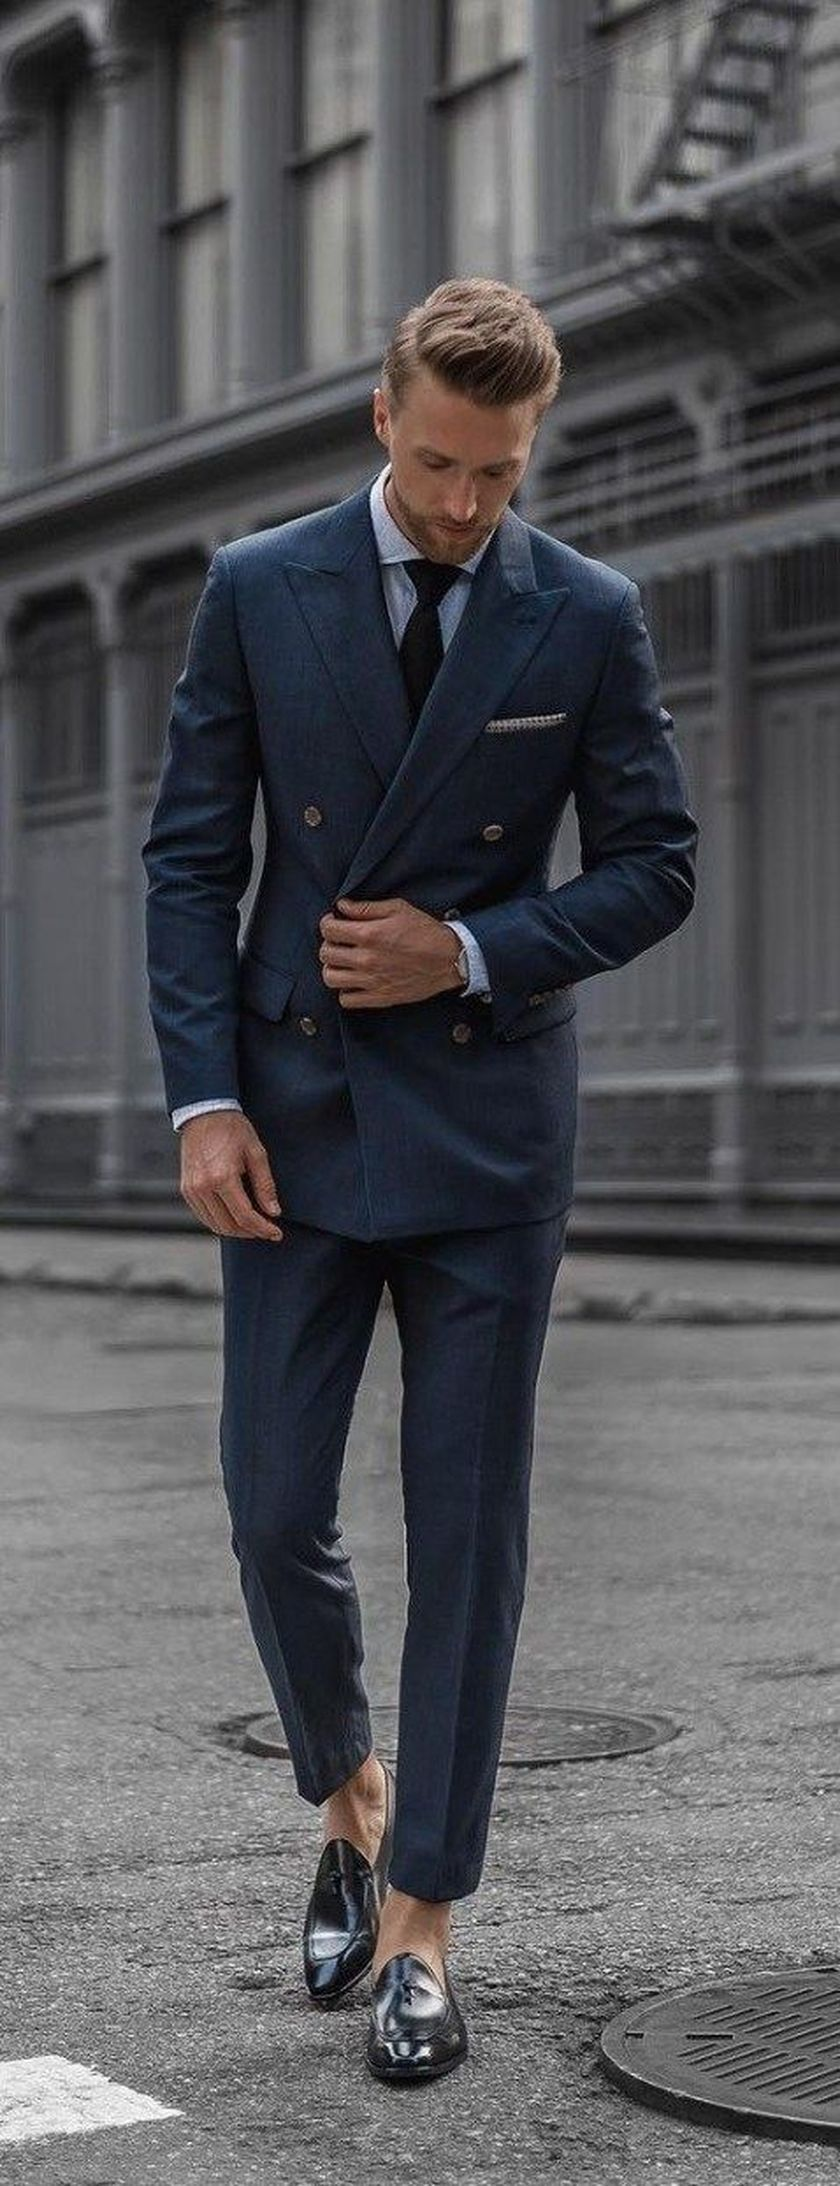 35 spring wedding outfit ideas for men summer wedding